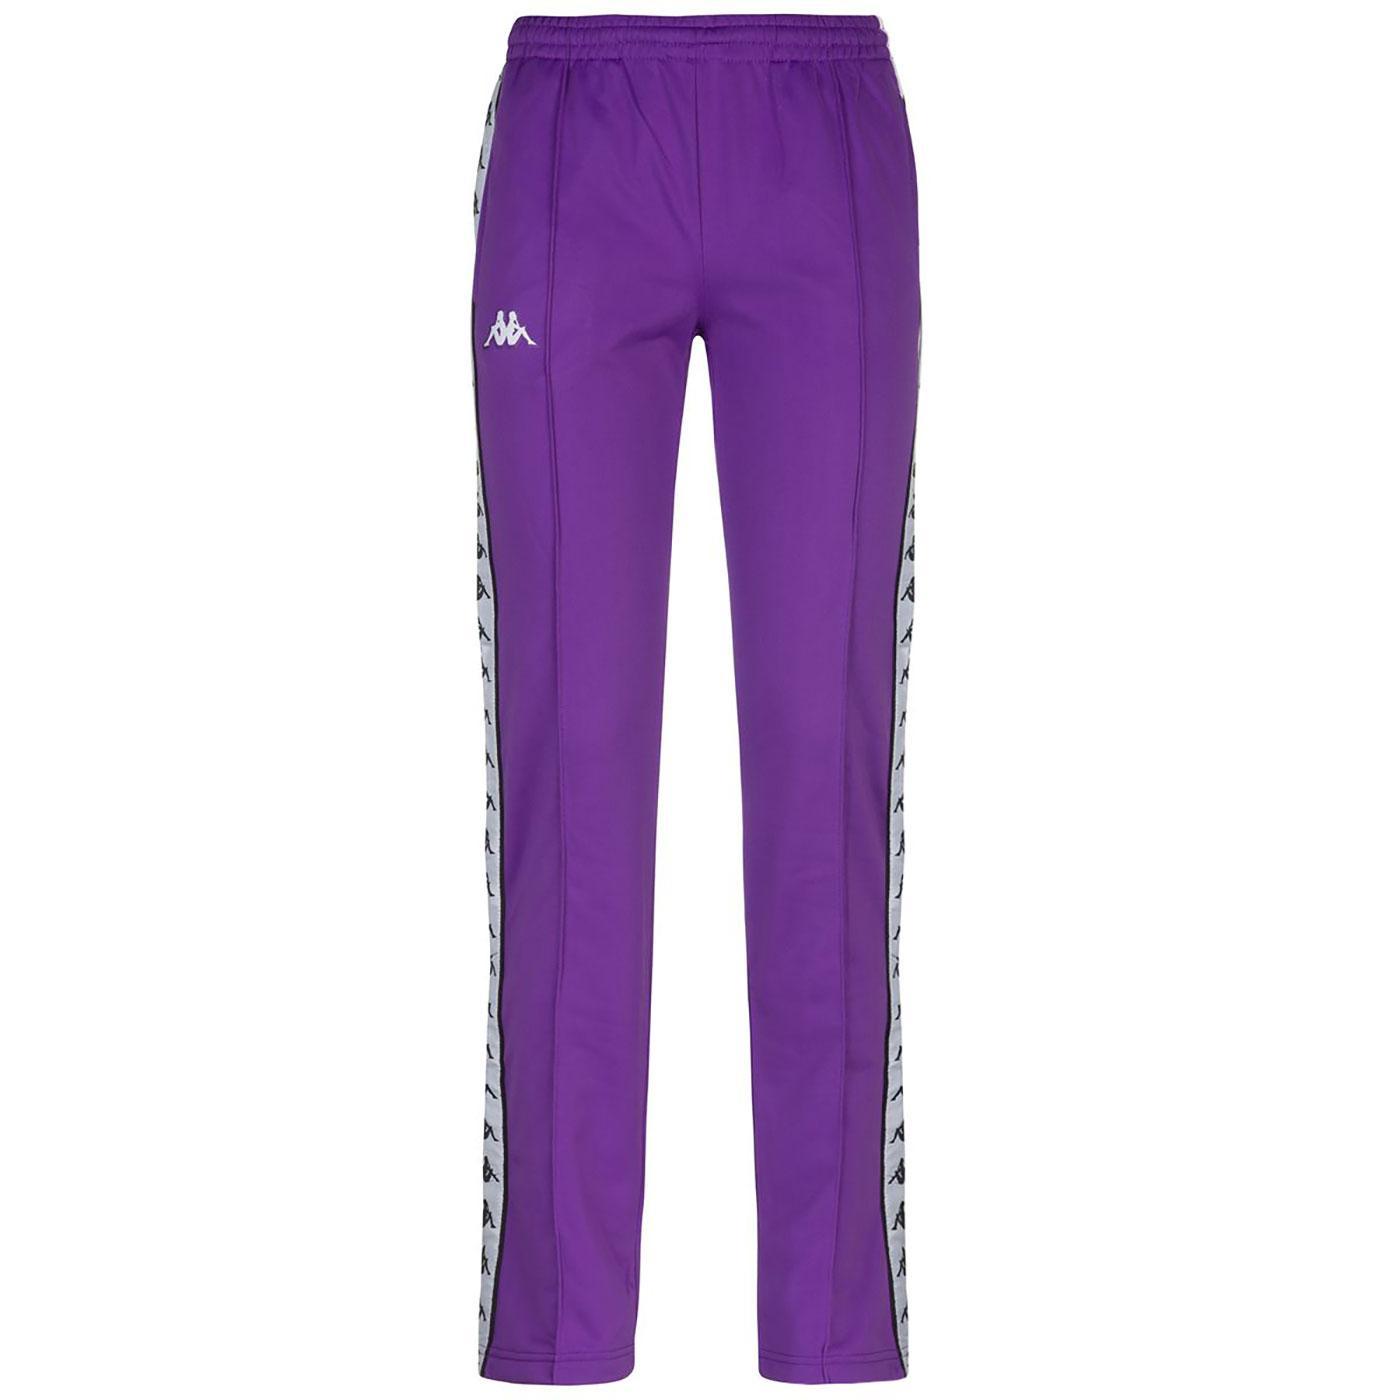 Wastoria Snaps KAPPA Women's slim Track Pants (V)